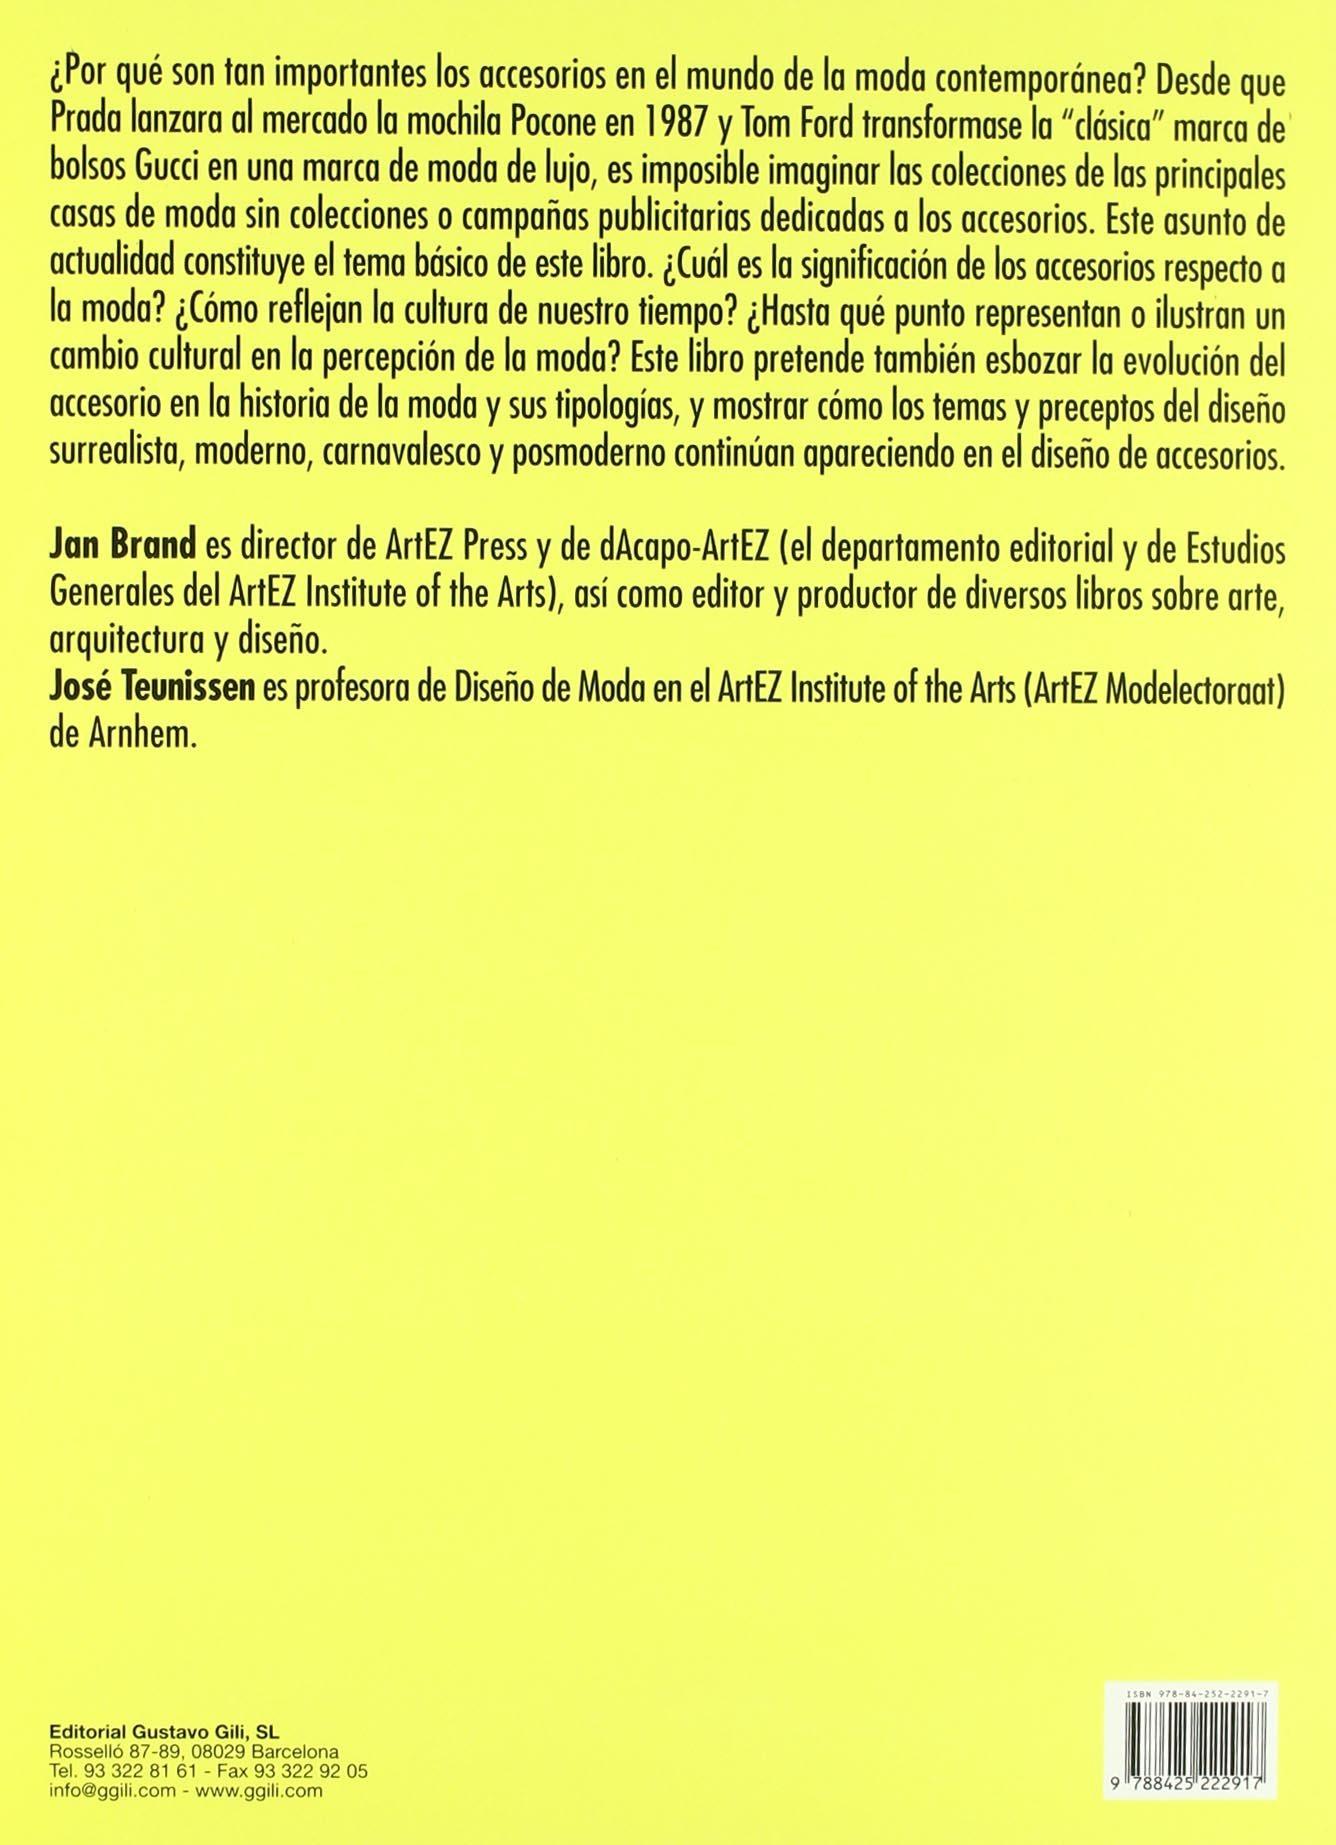 Moda y accesorios (Gg Moda (gustavo Gili)): Amazon.es: Brand, Jan ...